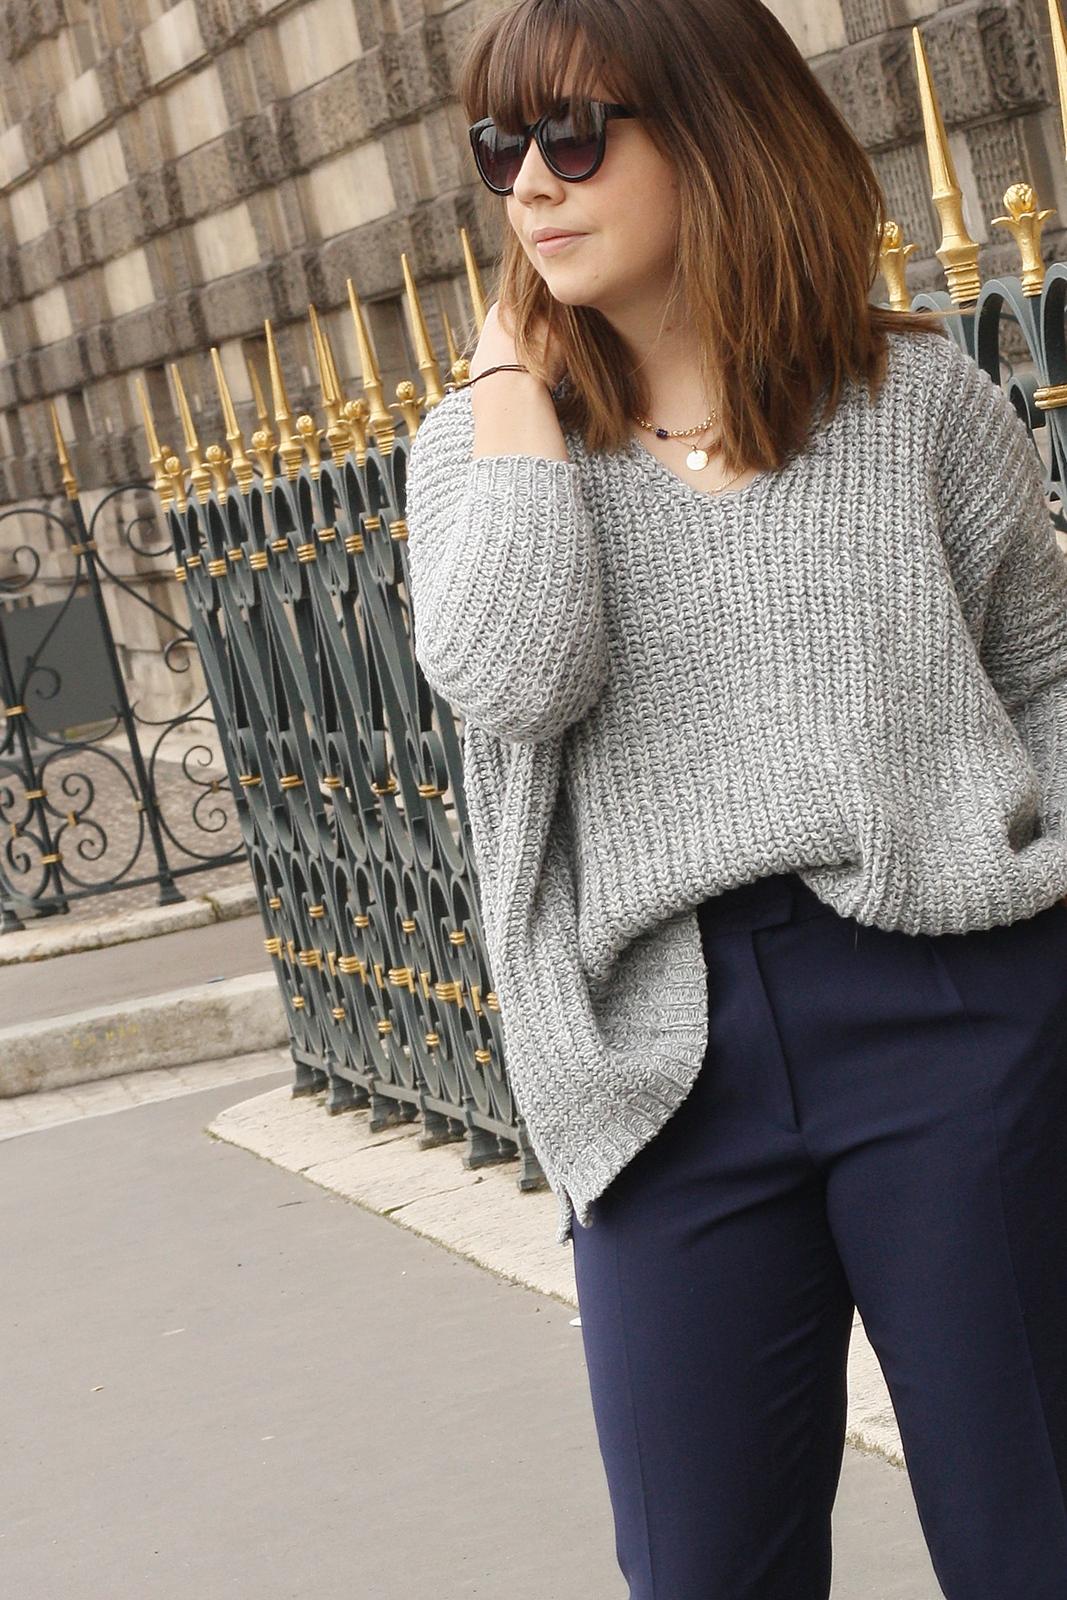 Blog mode femme Paris - Du style, Madame - Streetstyle - jupe culotte - navy